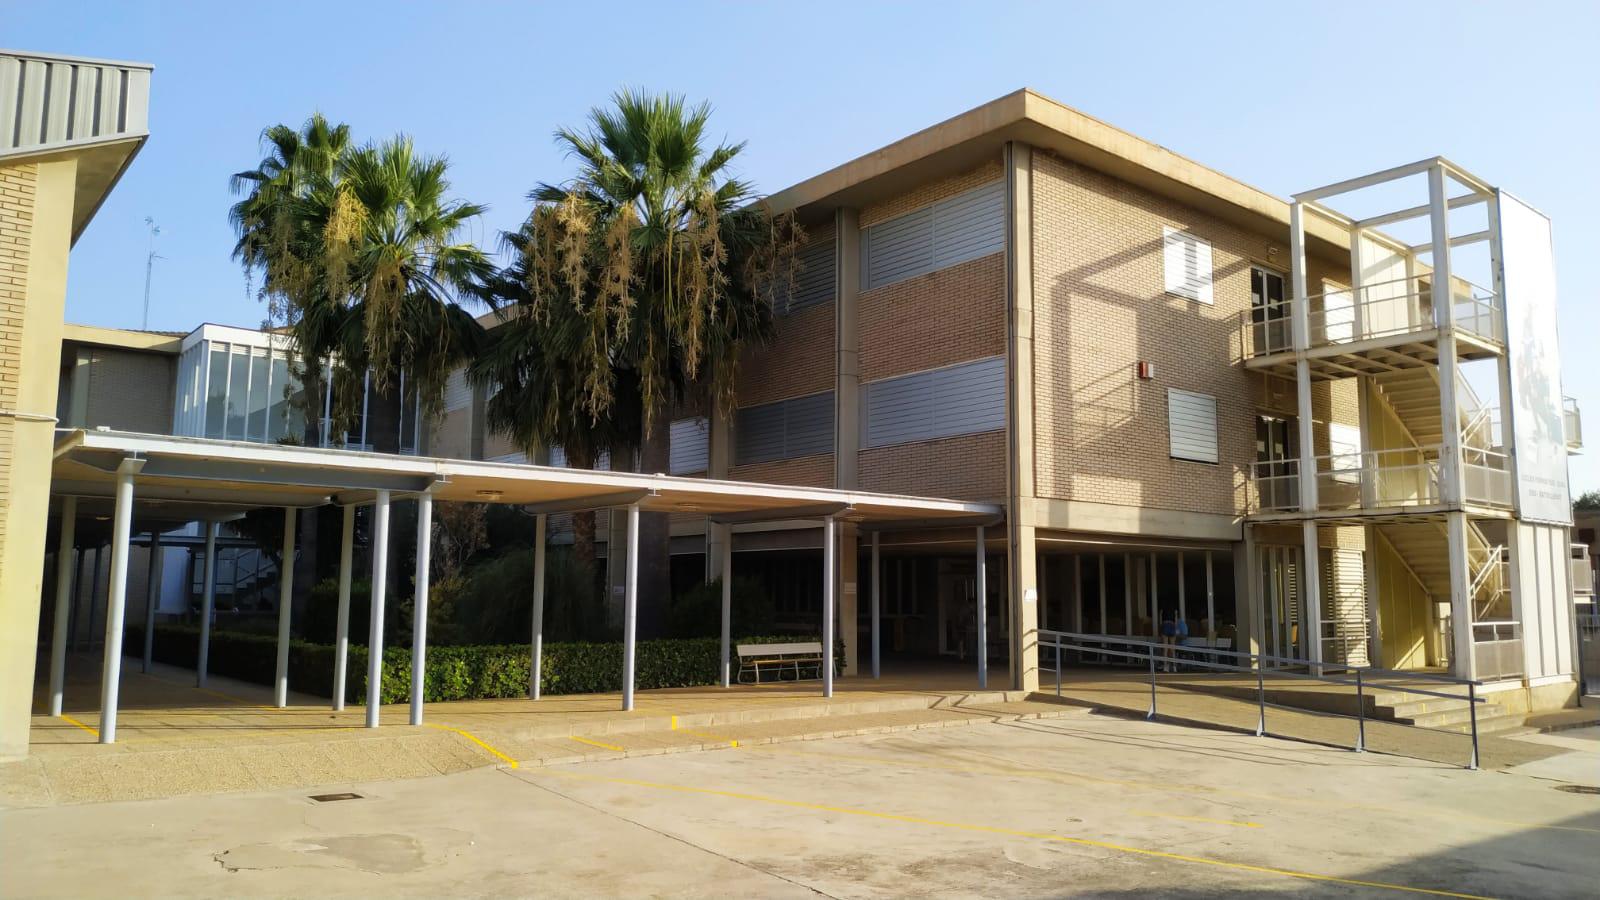 I.E.S. Federica Montseny de Burjassot (Valencia).